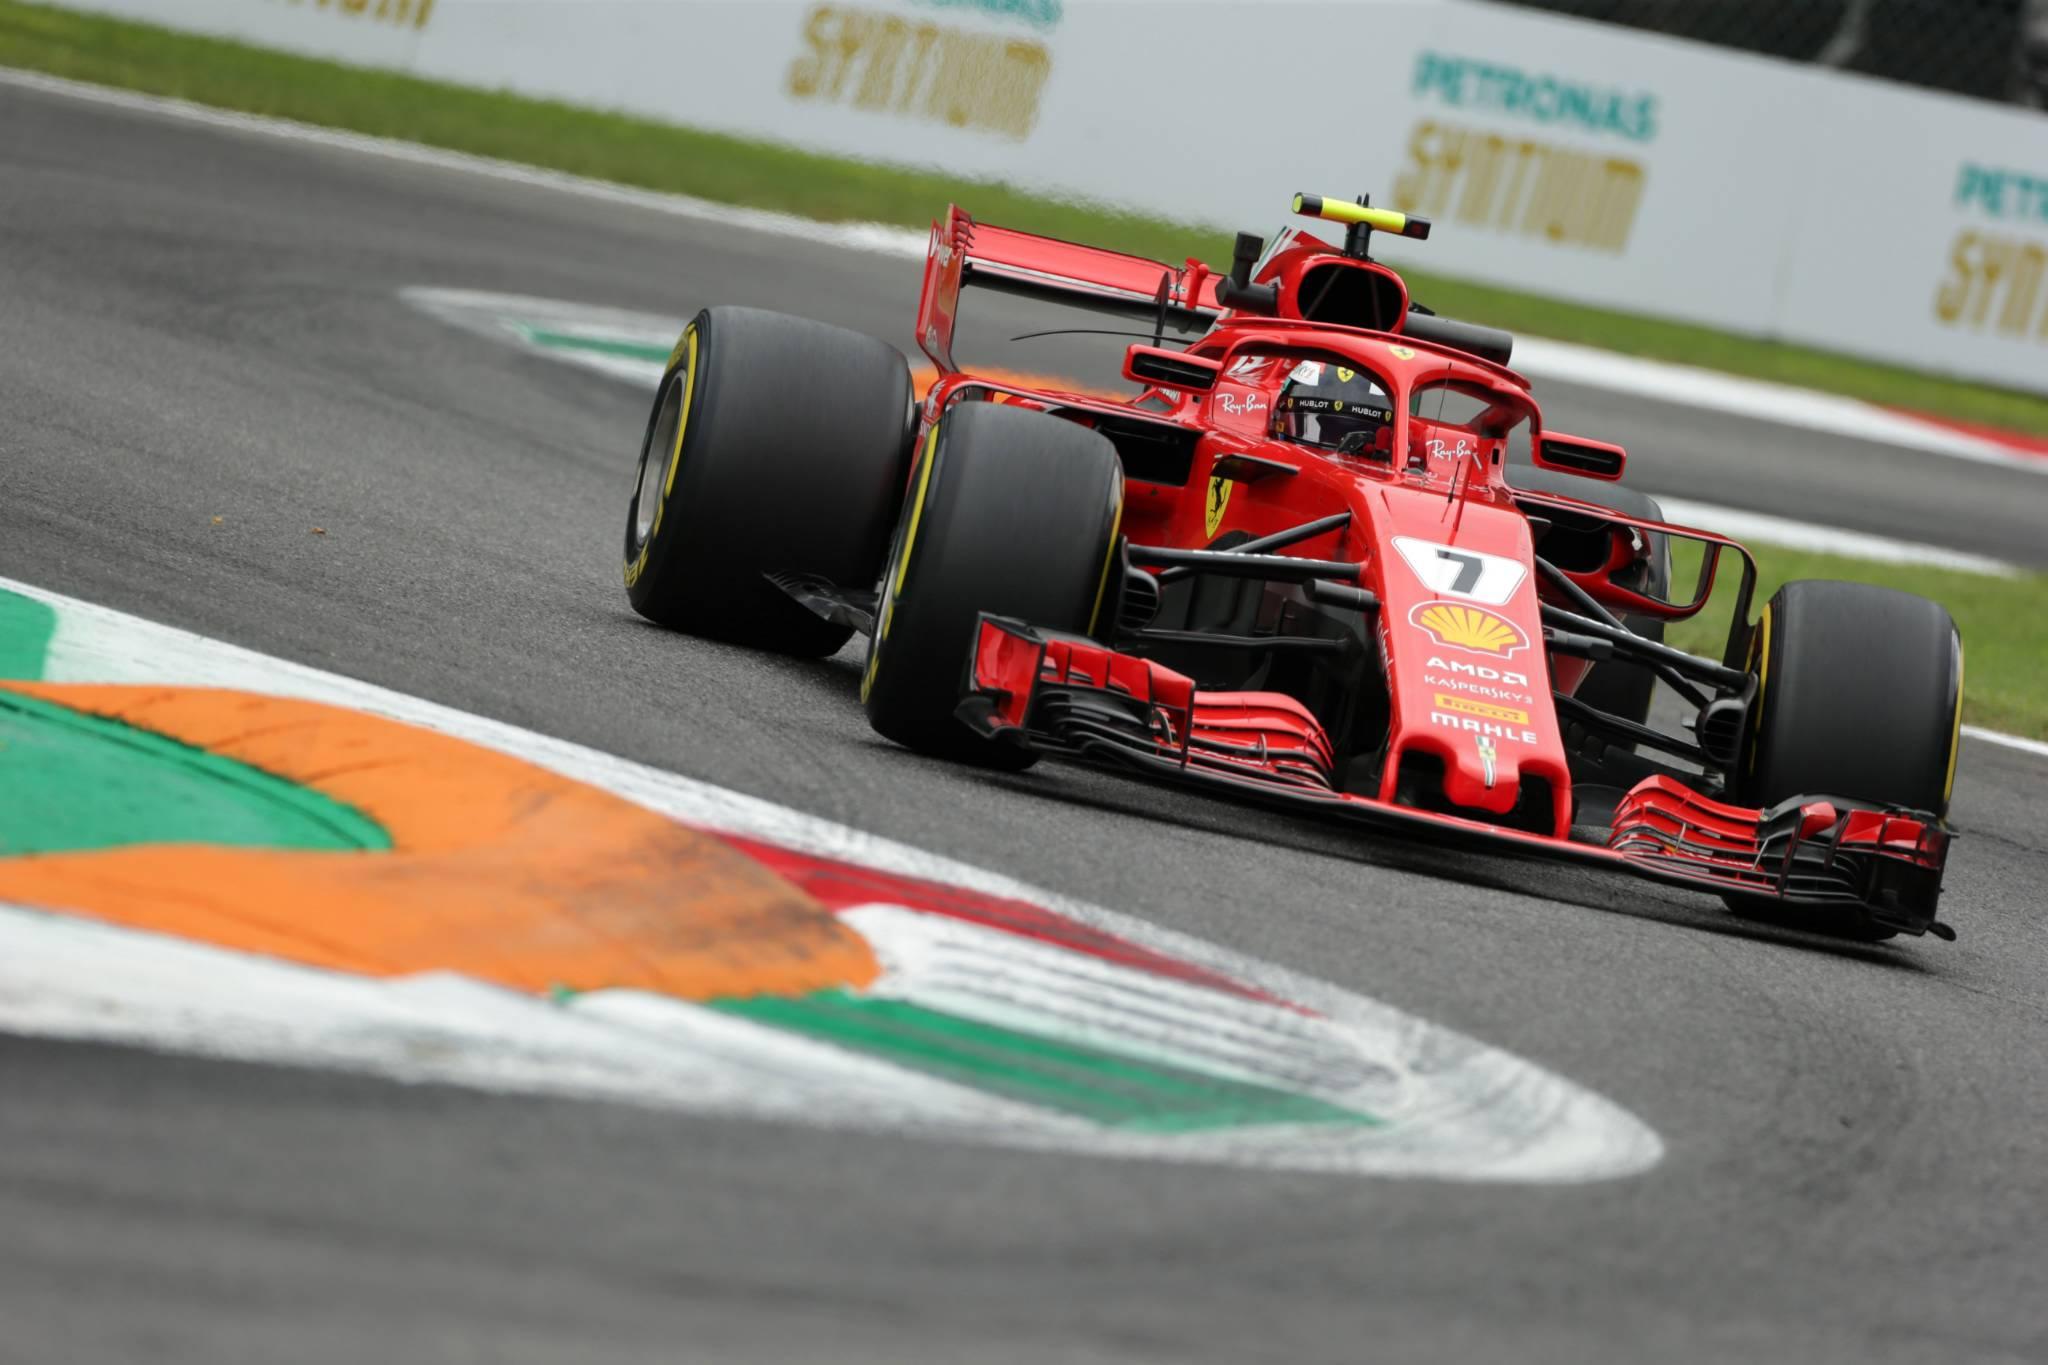 31.08.2018 - Free Practice 2, Kimi Raikkonen (FIN) Scuderia Ferrari SF71H